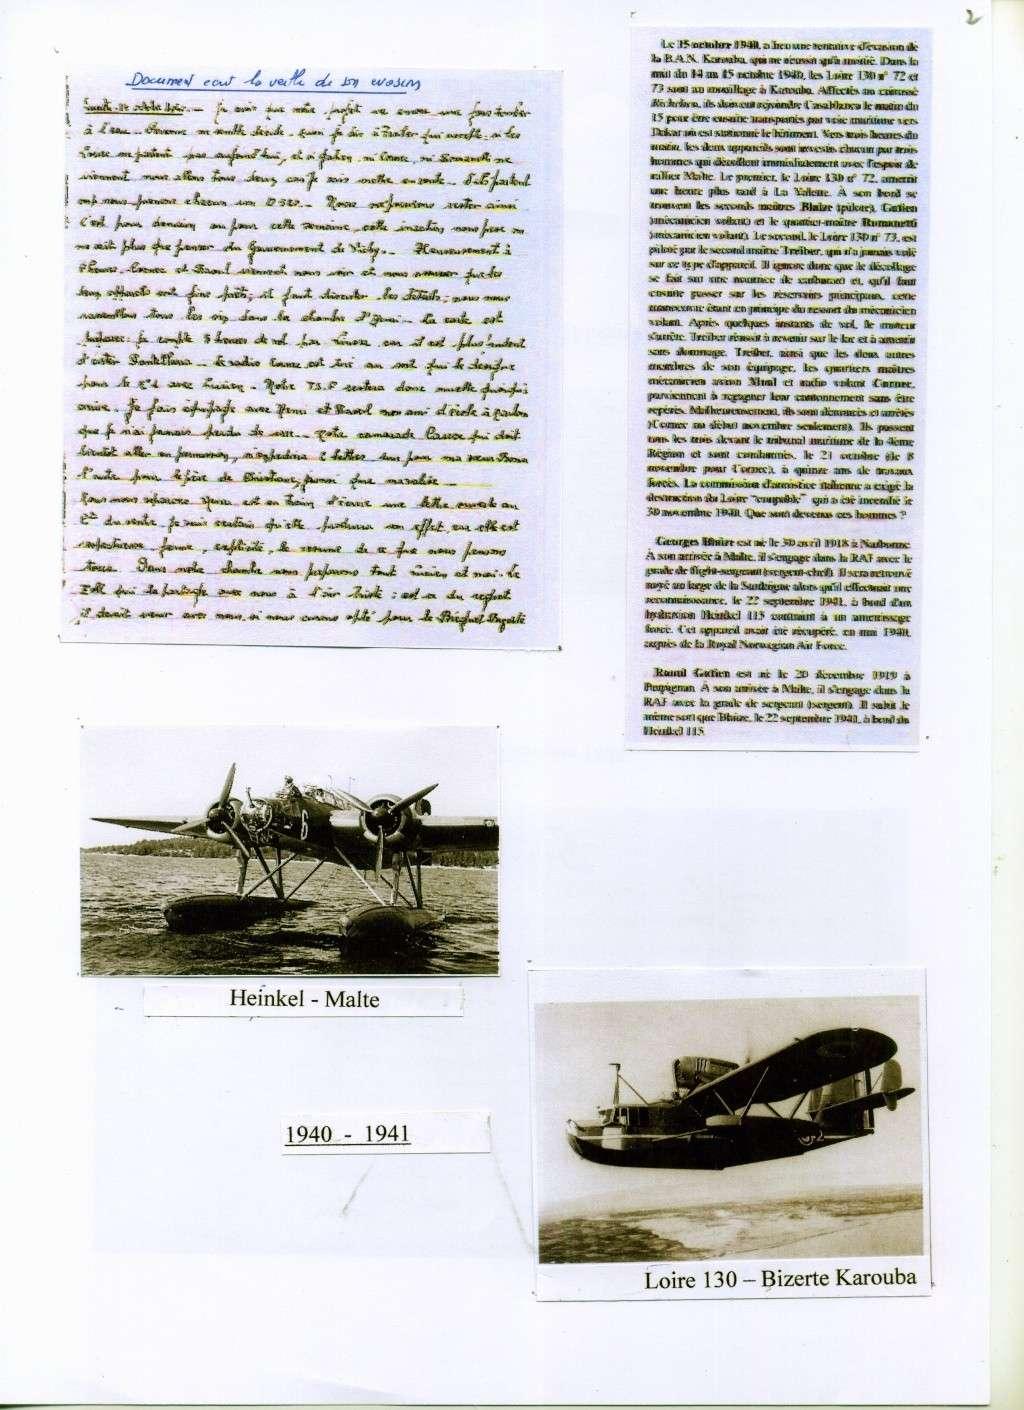 FNFL - FAFL L'appel du général de Gaulle Freres34